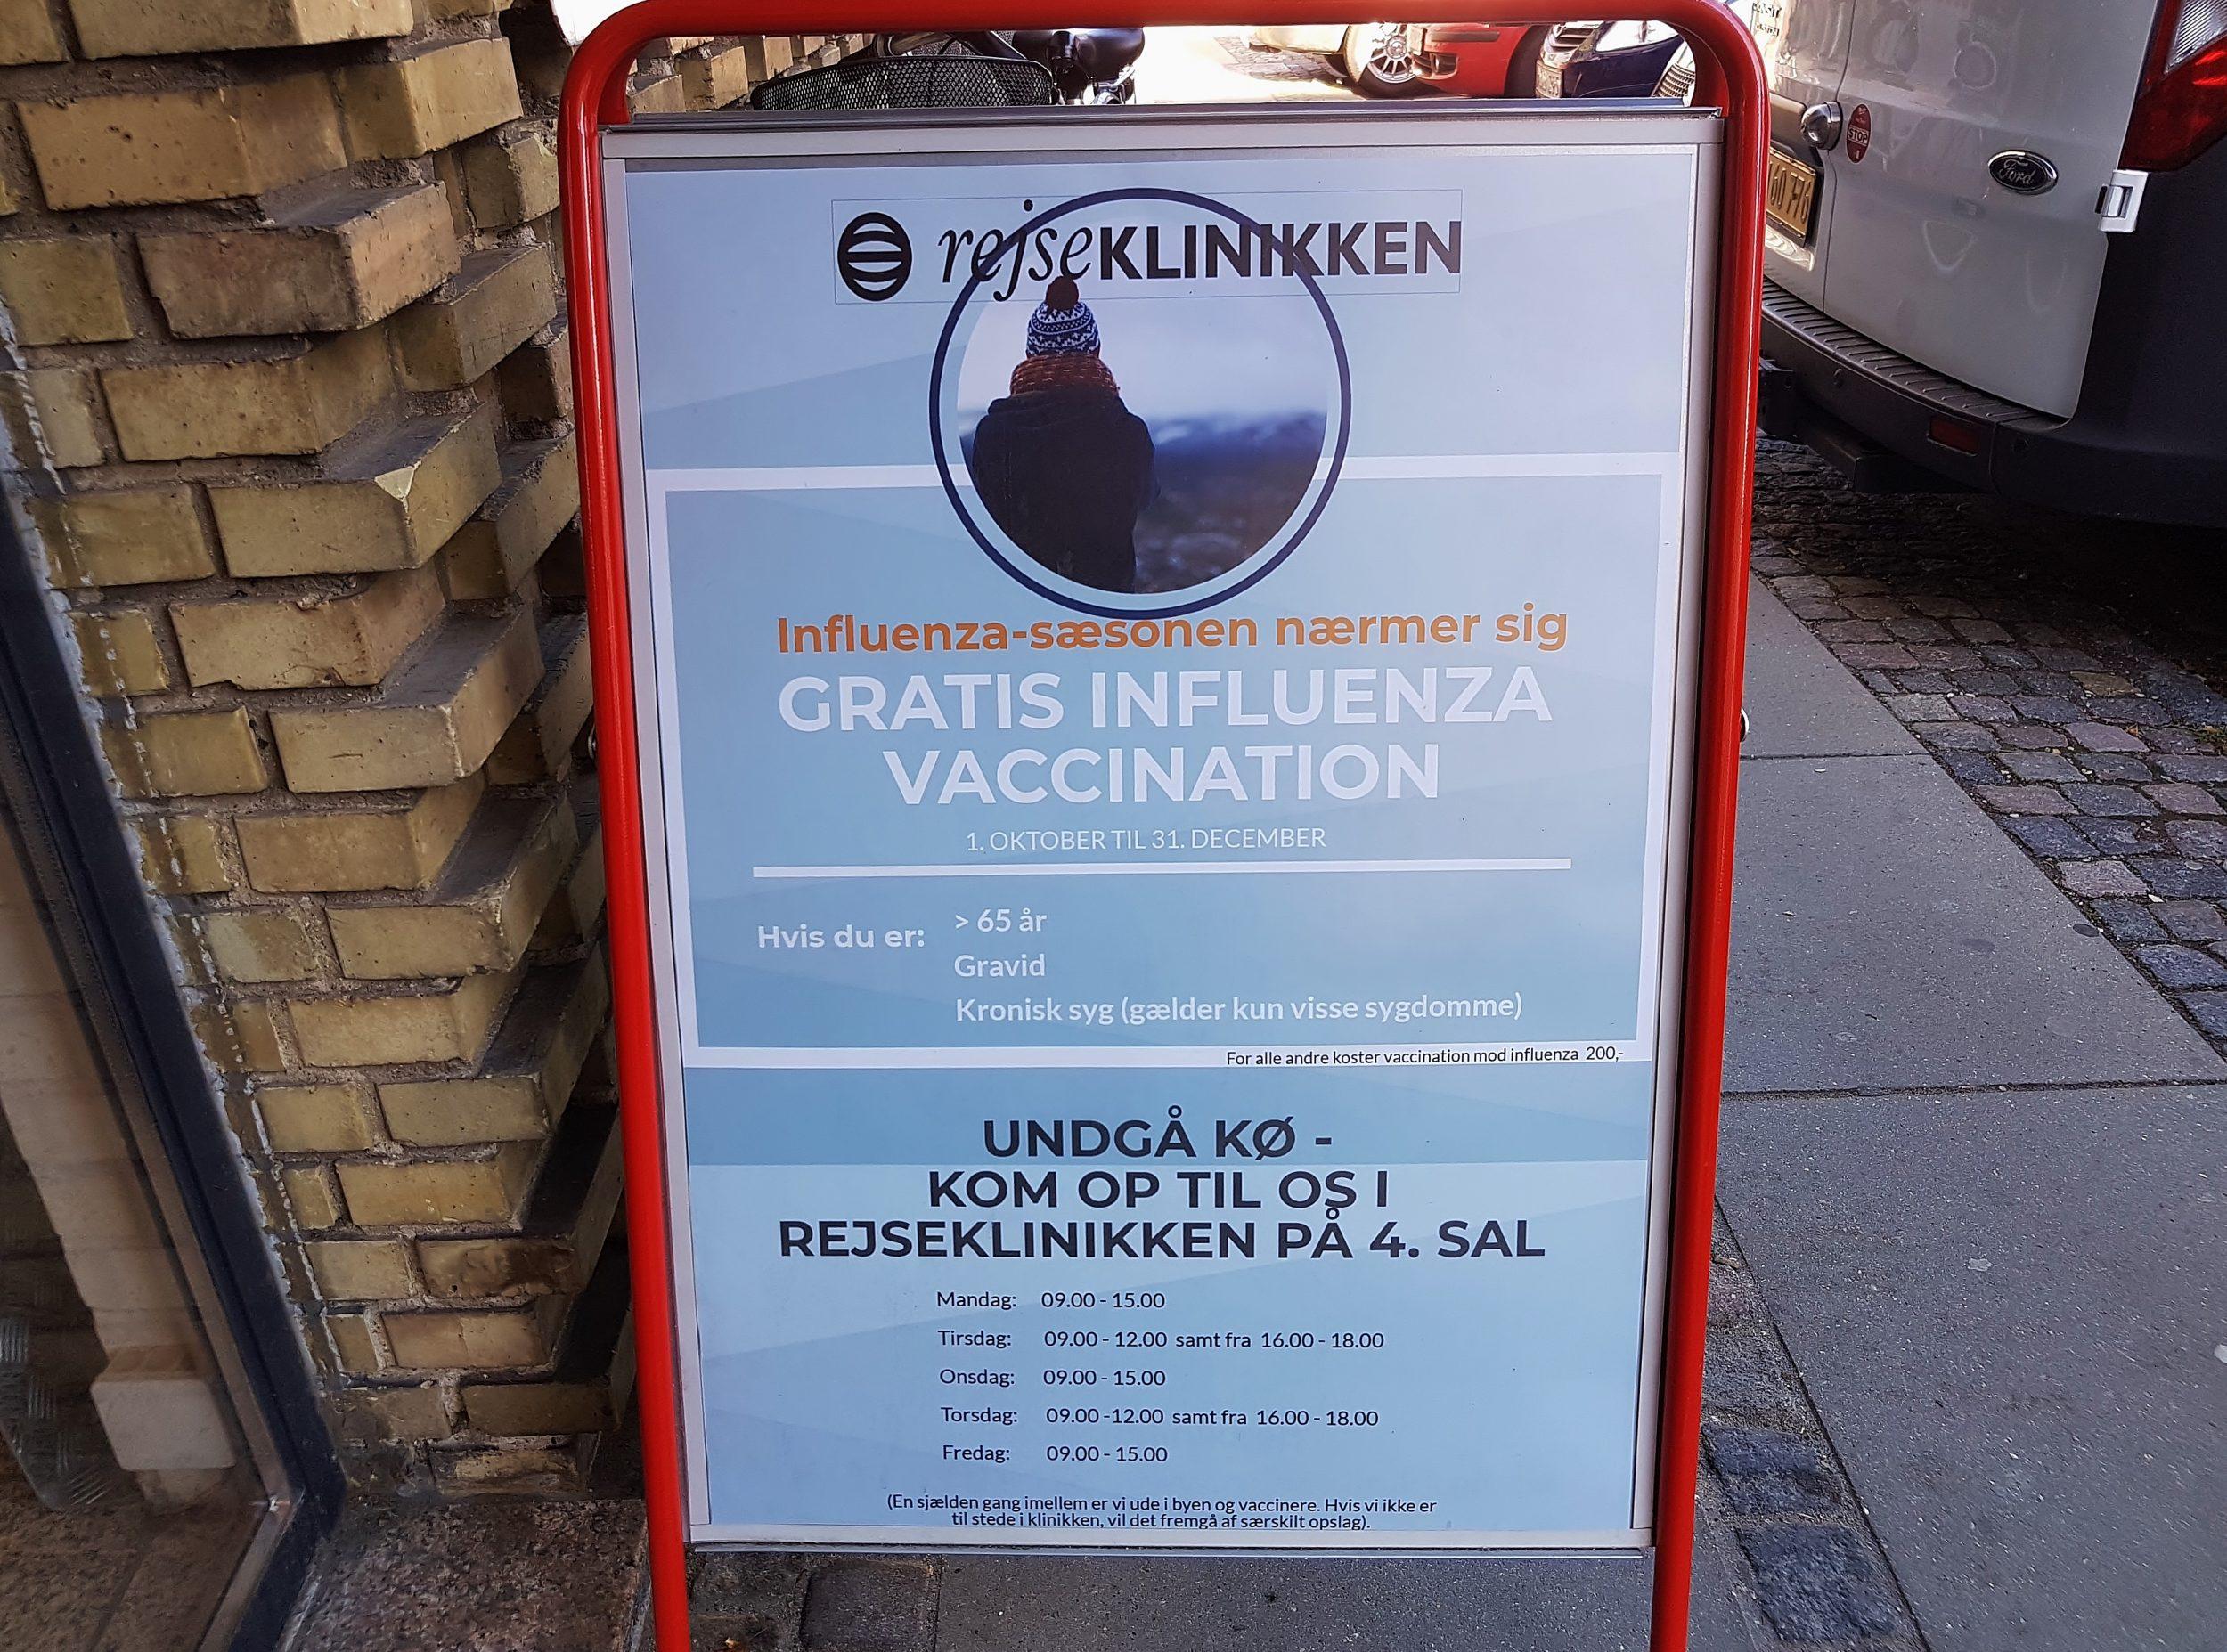 Influenza-sæsonen nærmer sig